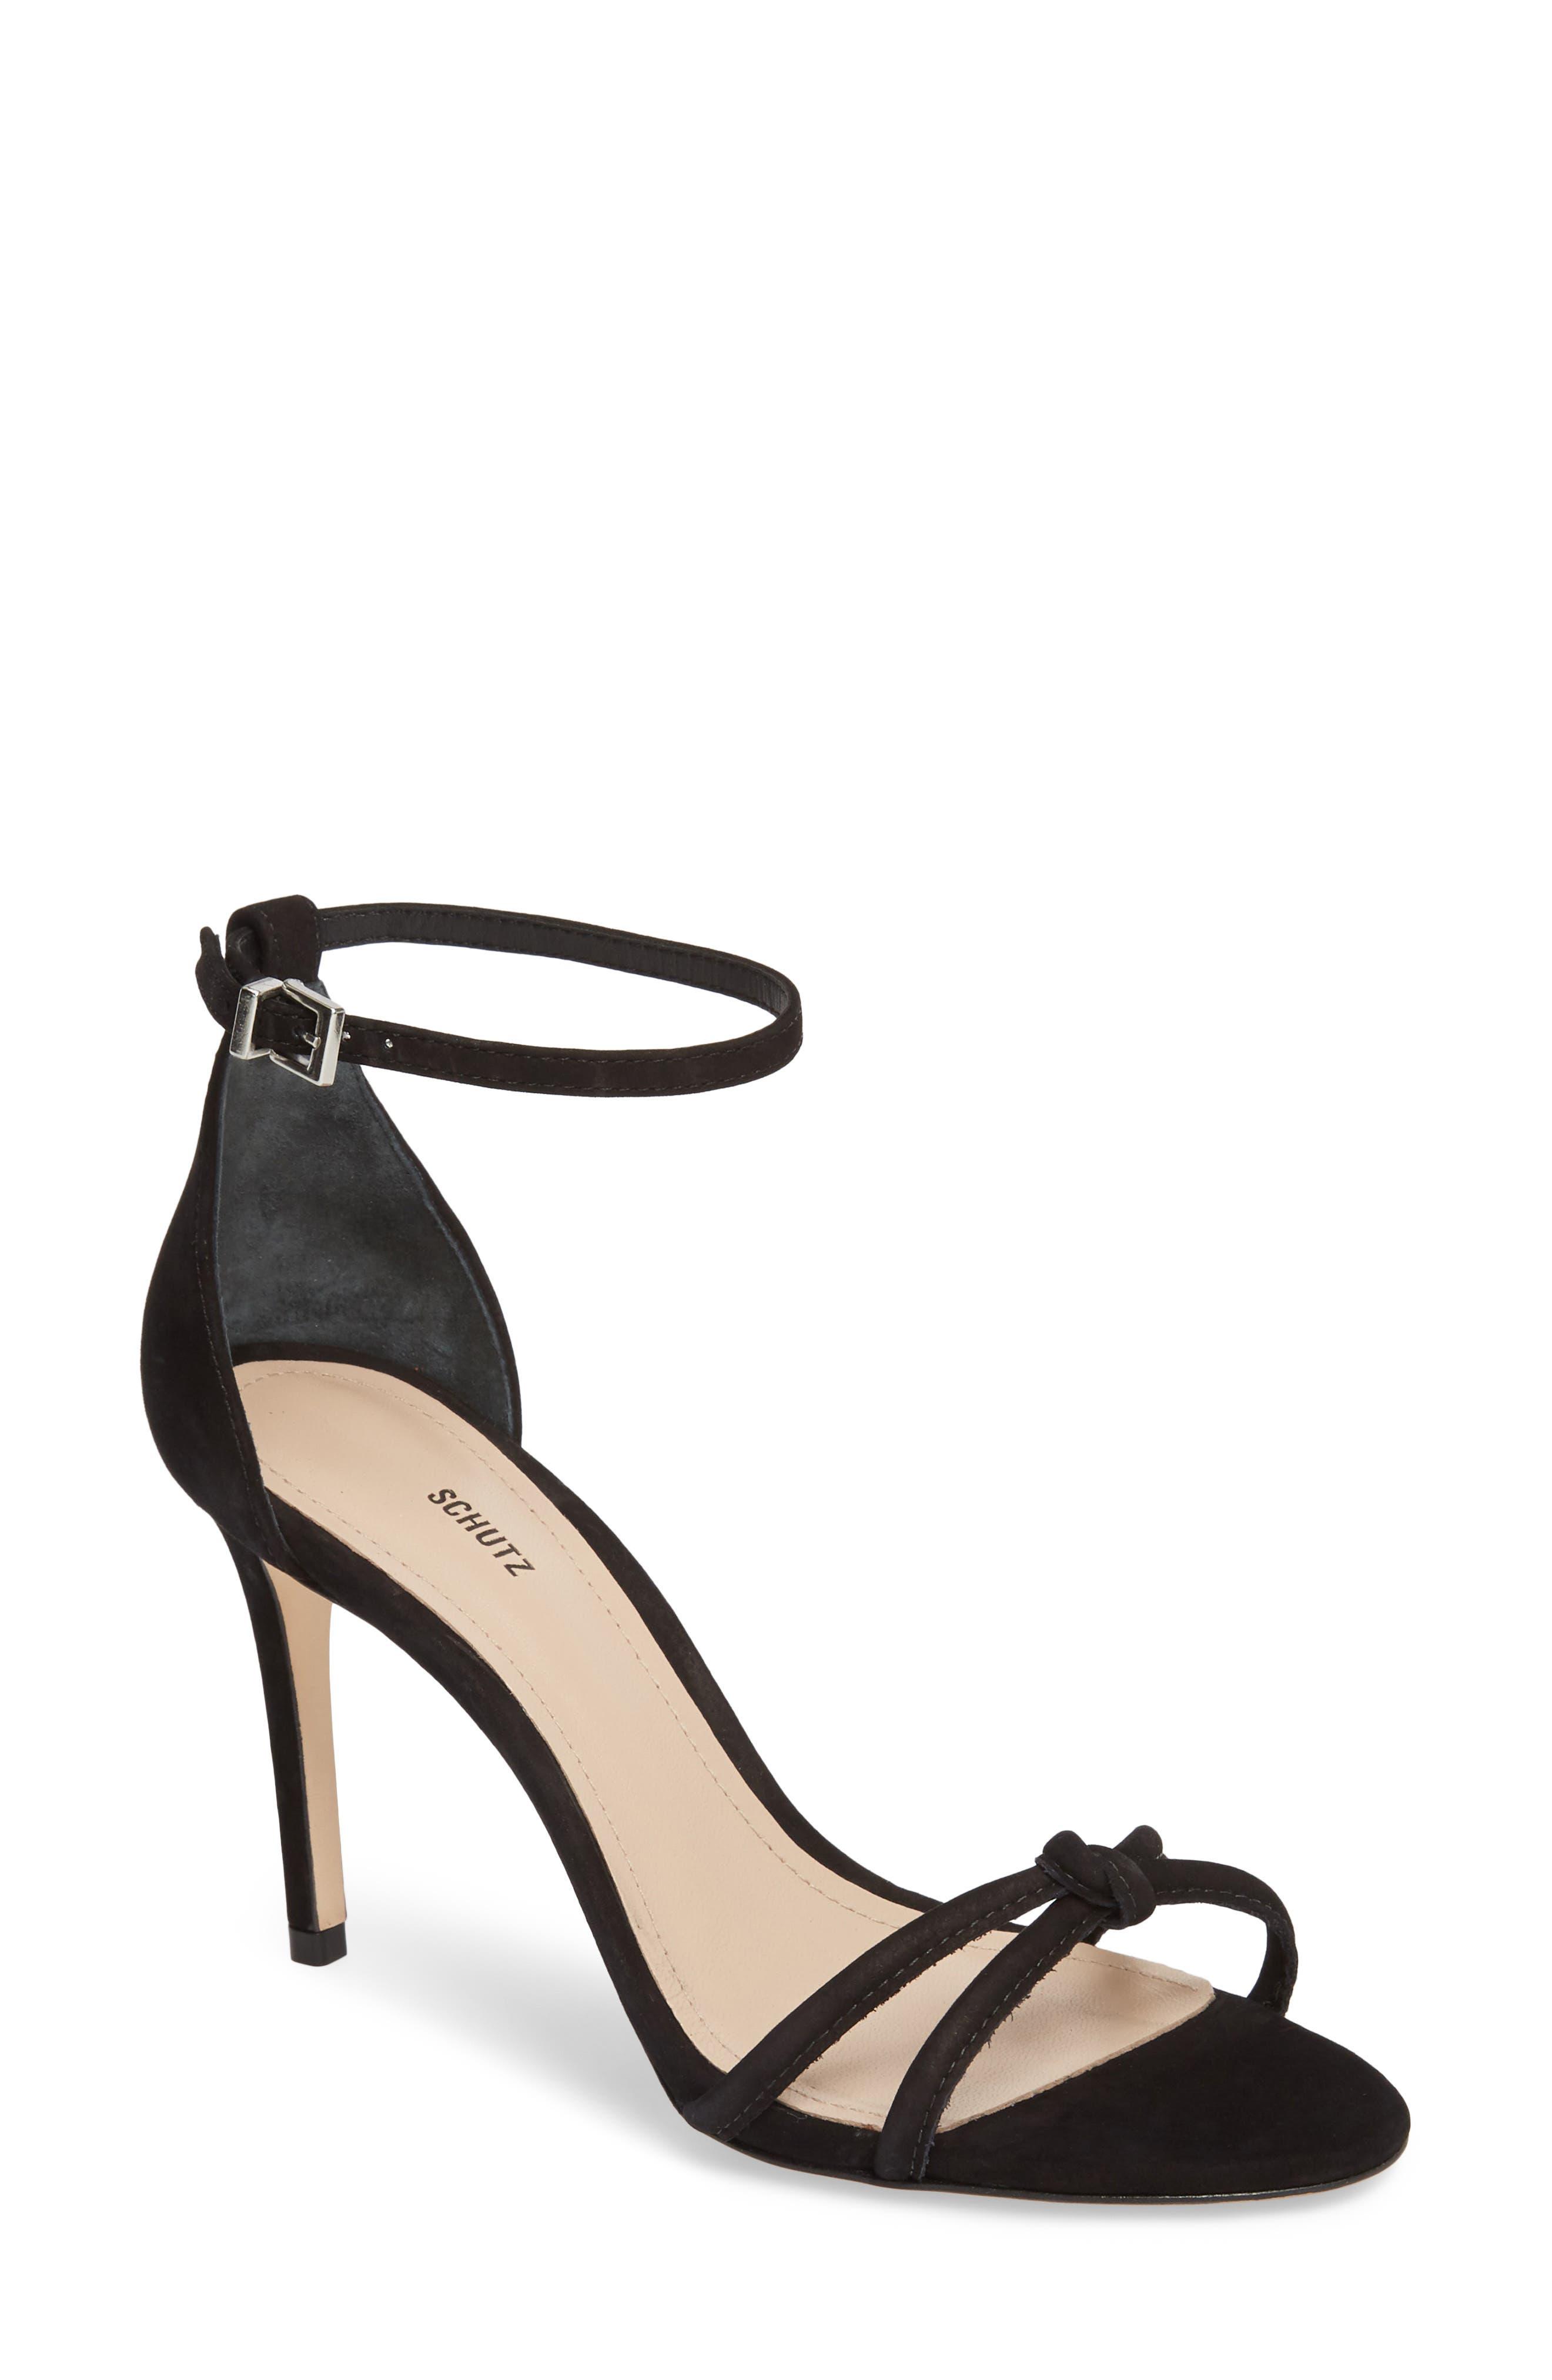 Rhana Ankle Strap Sandal,                         Main,                         color, Black Leather